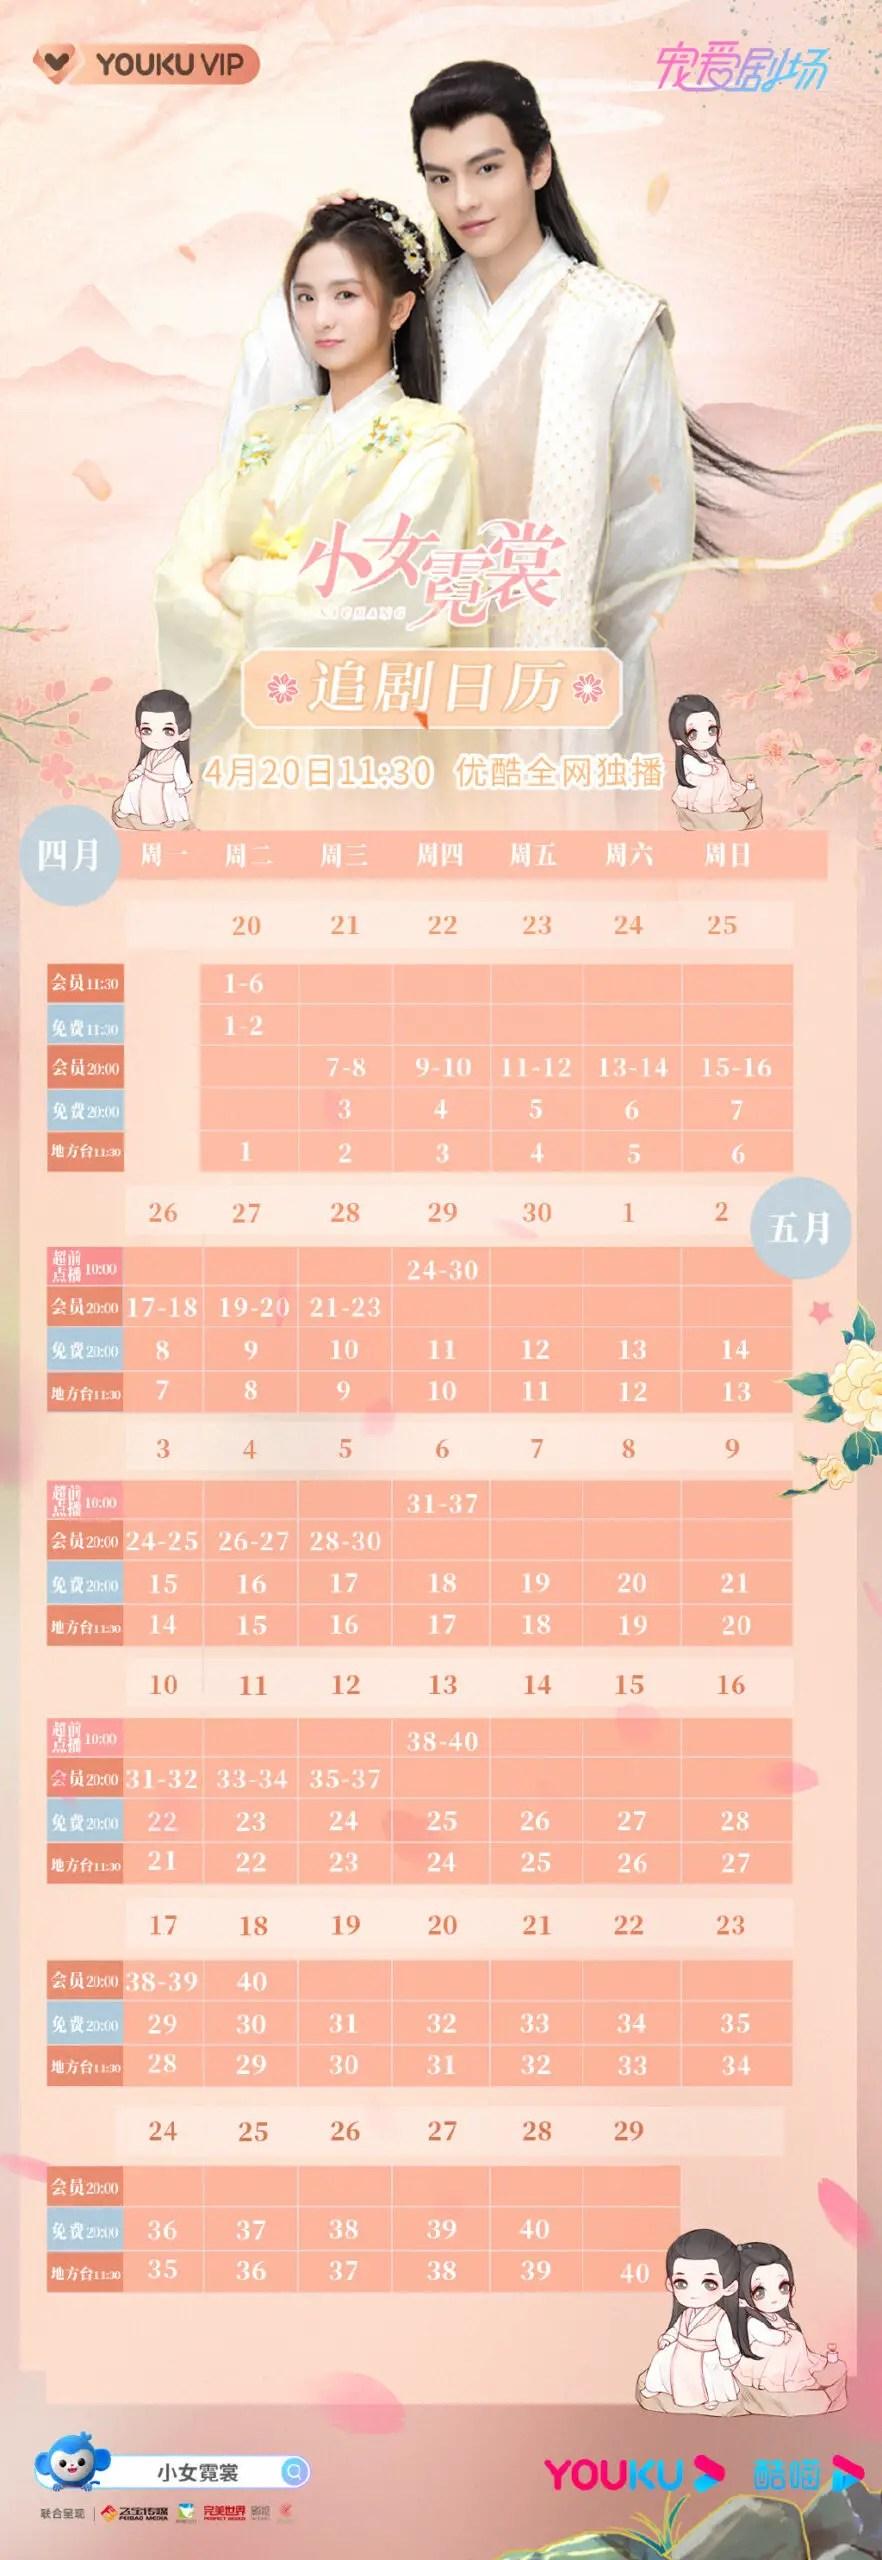 Ni Shang Chinese Drama Airing Calendar